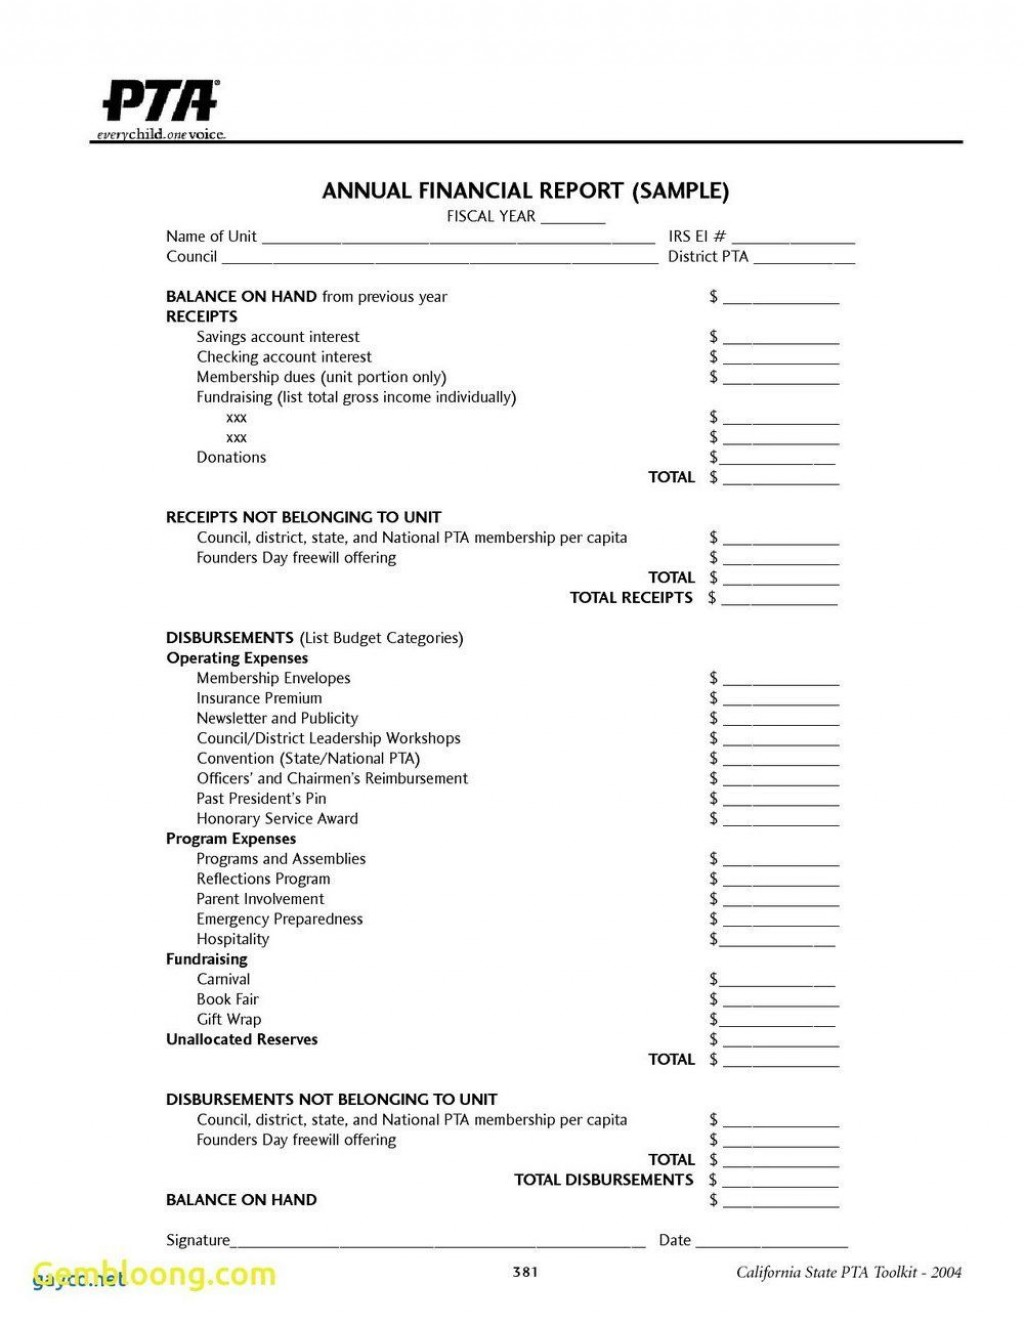 004 Singular Treasurer Report Template Non Profit Design  Treasurer' Word Free For Nonprofit OrganizationLarge